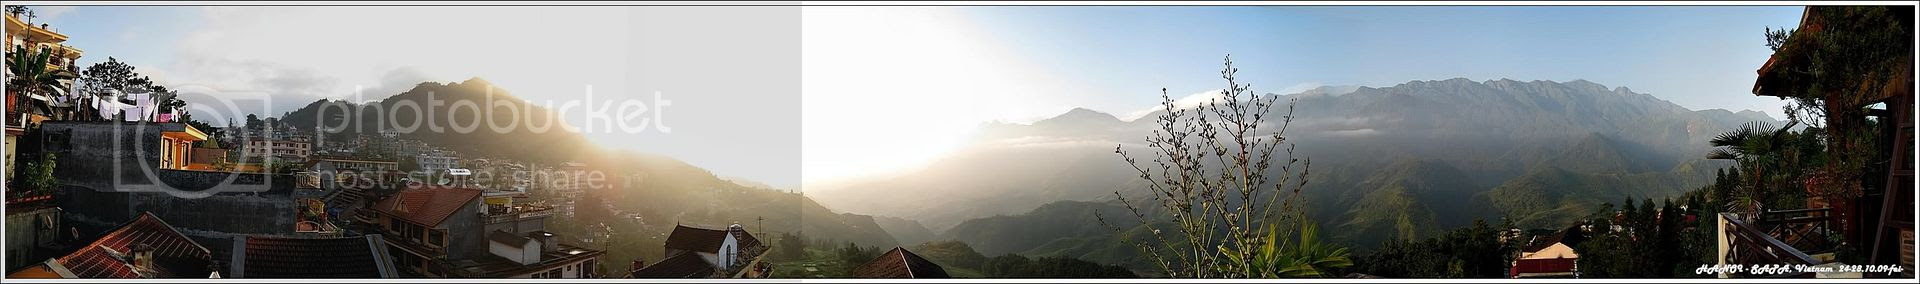 27-10-2009 Sapa Panorama Morning View